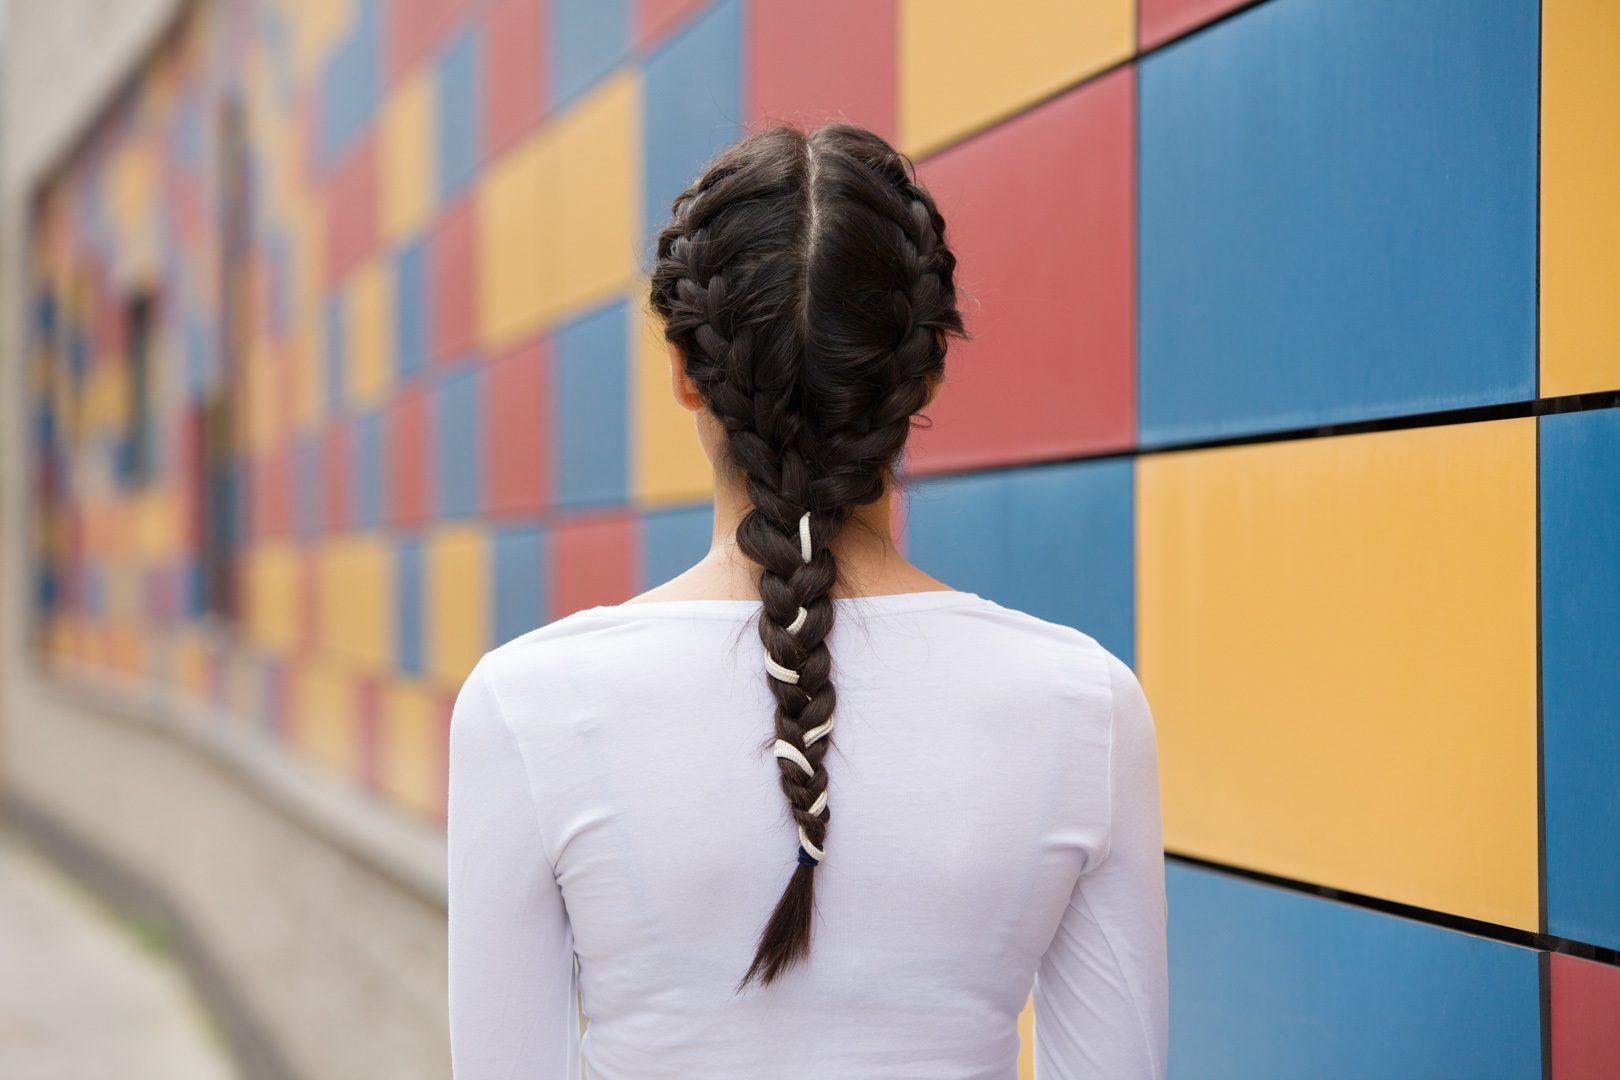 Gaya rambut sporty double braid jadi satu.